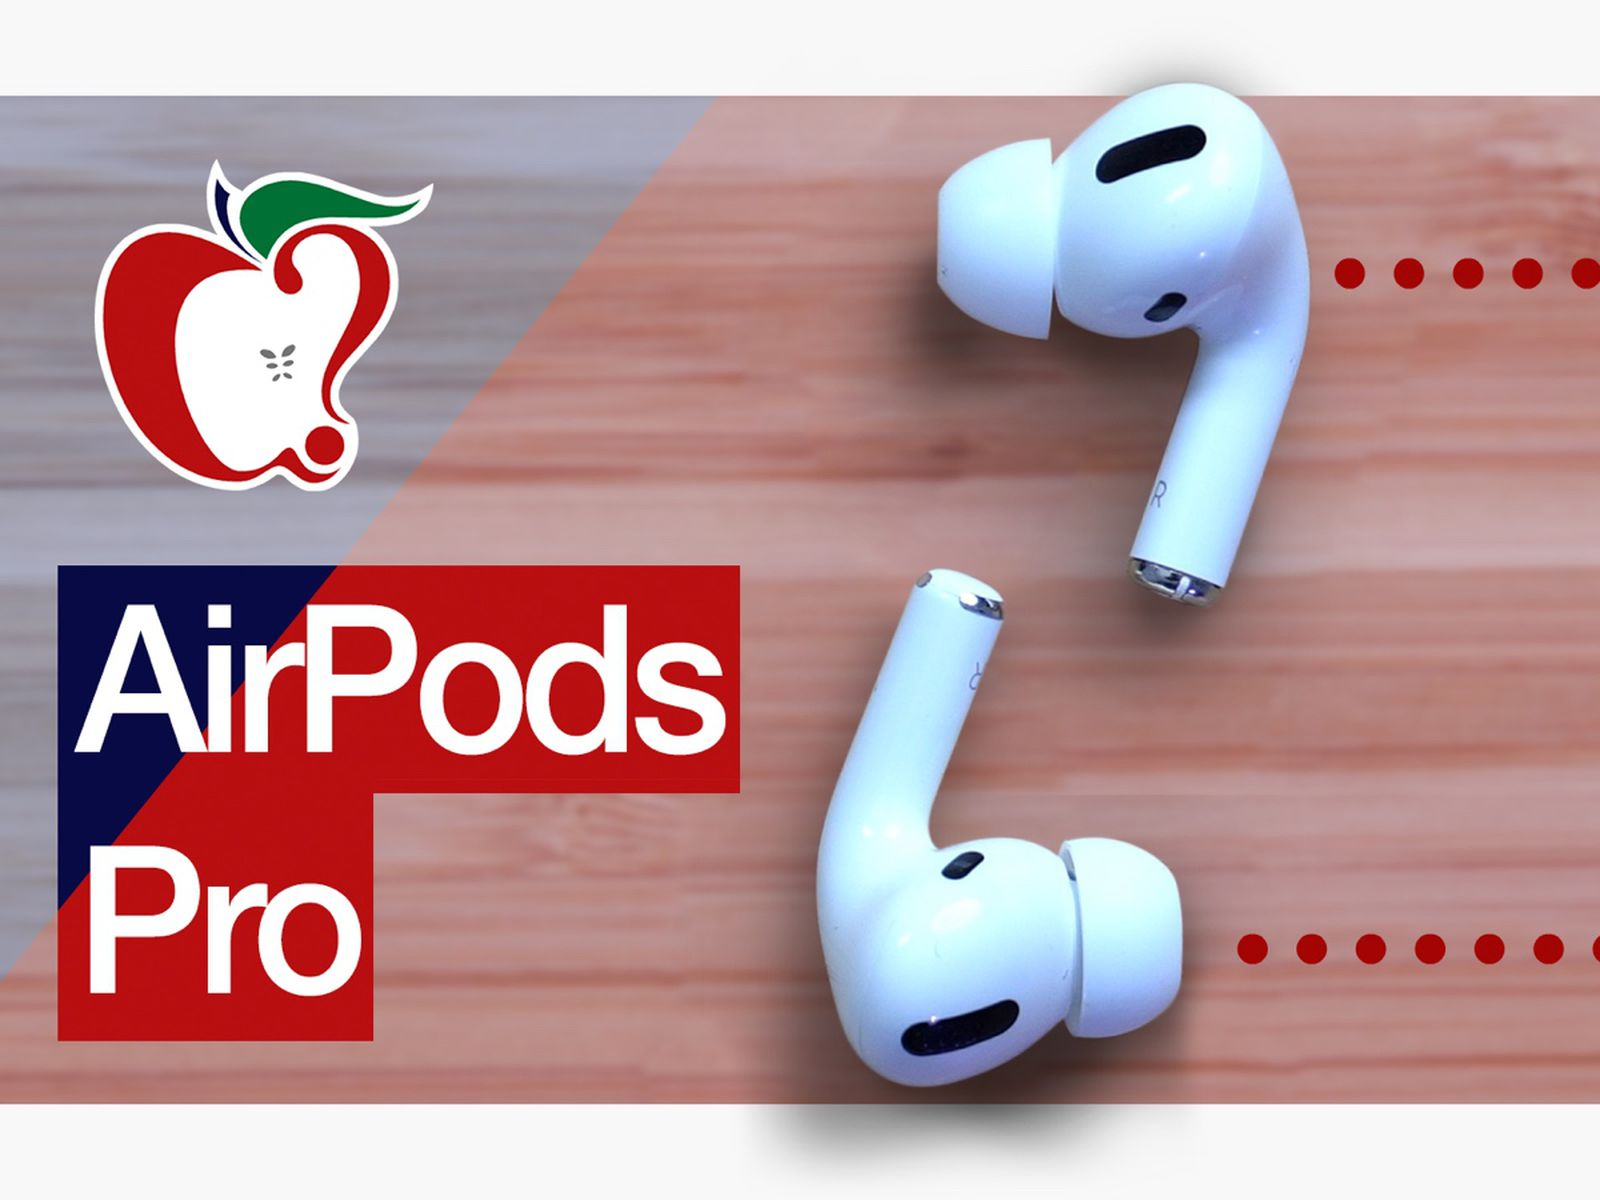 Fake 95 Airpods Pro Vs Real Airpods Pro Macrumors